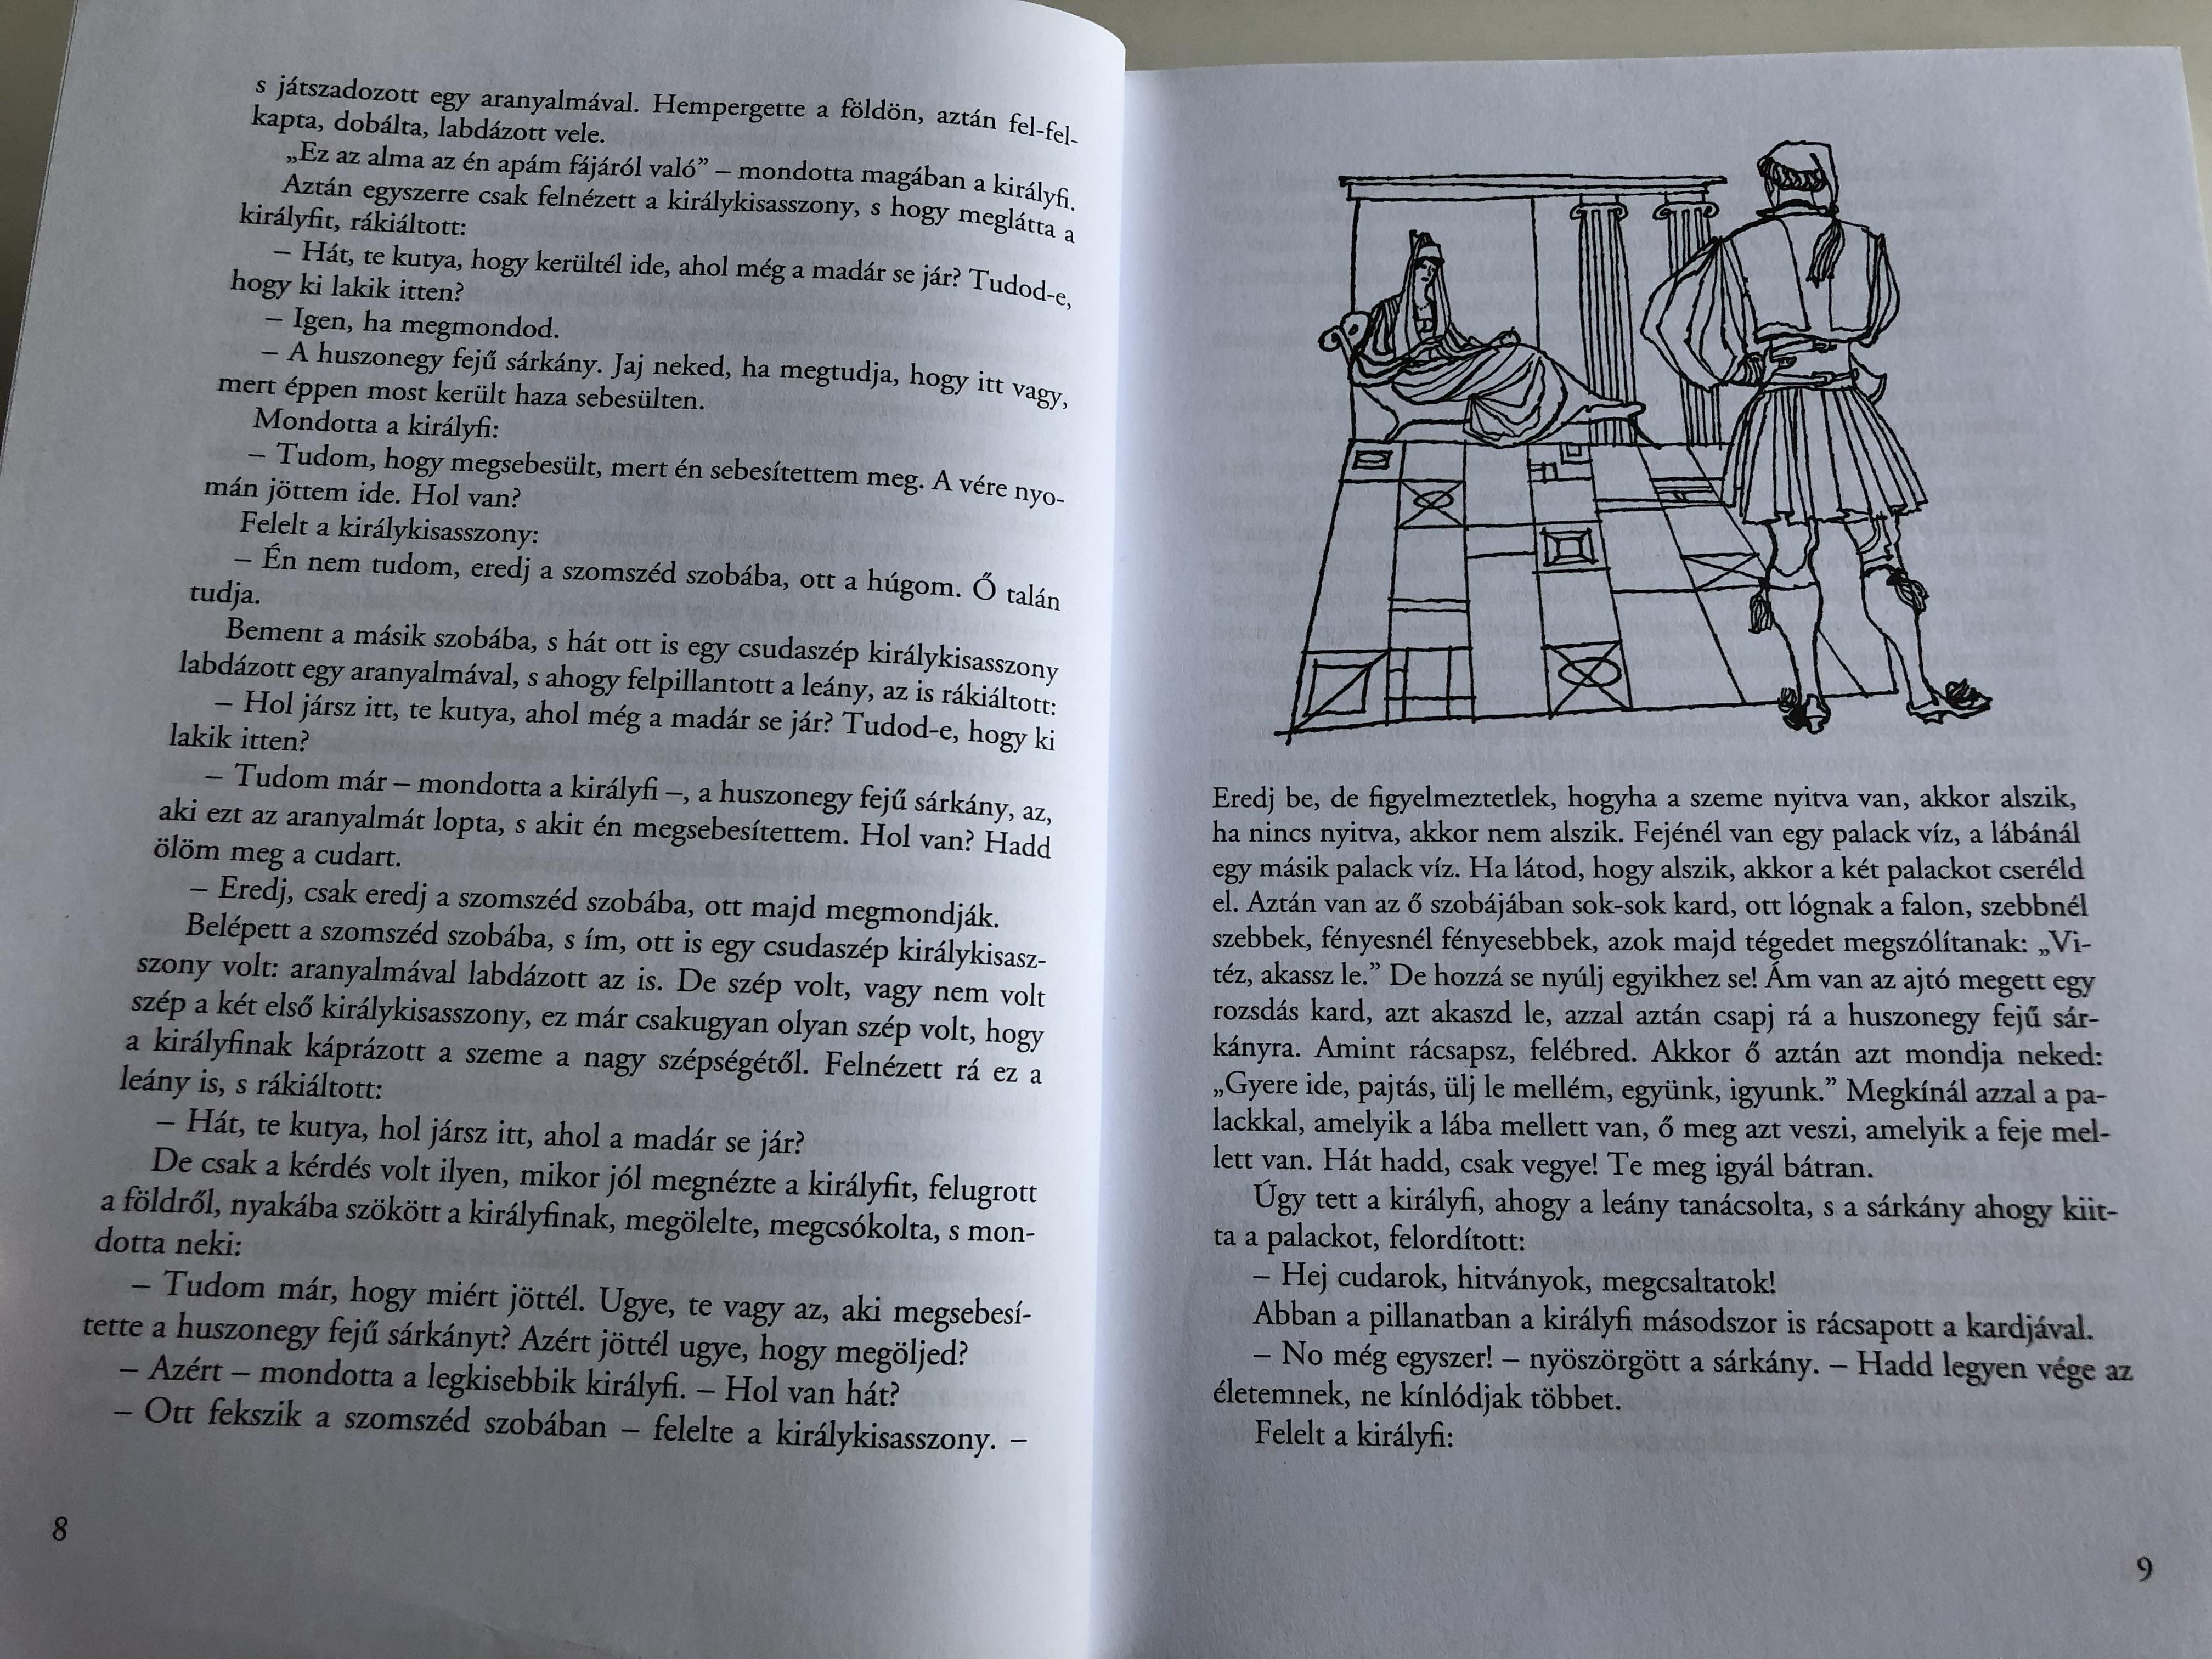 az-aranyalmafa-by-benedek-elek-foreign-stories-in-hungarian-language-7th-edition-illustrations-szecsk-tam-s-m-ra-k-nyvkiad-2013-4-.jpg